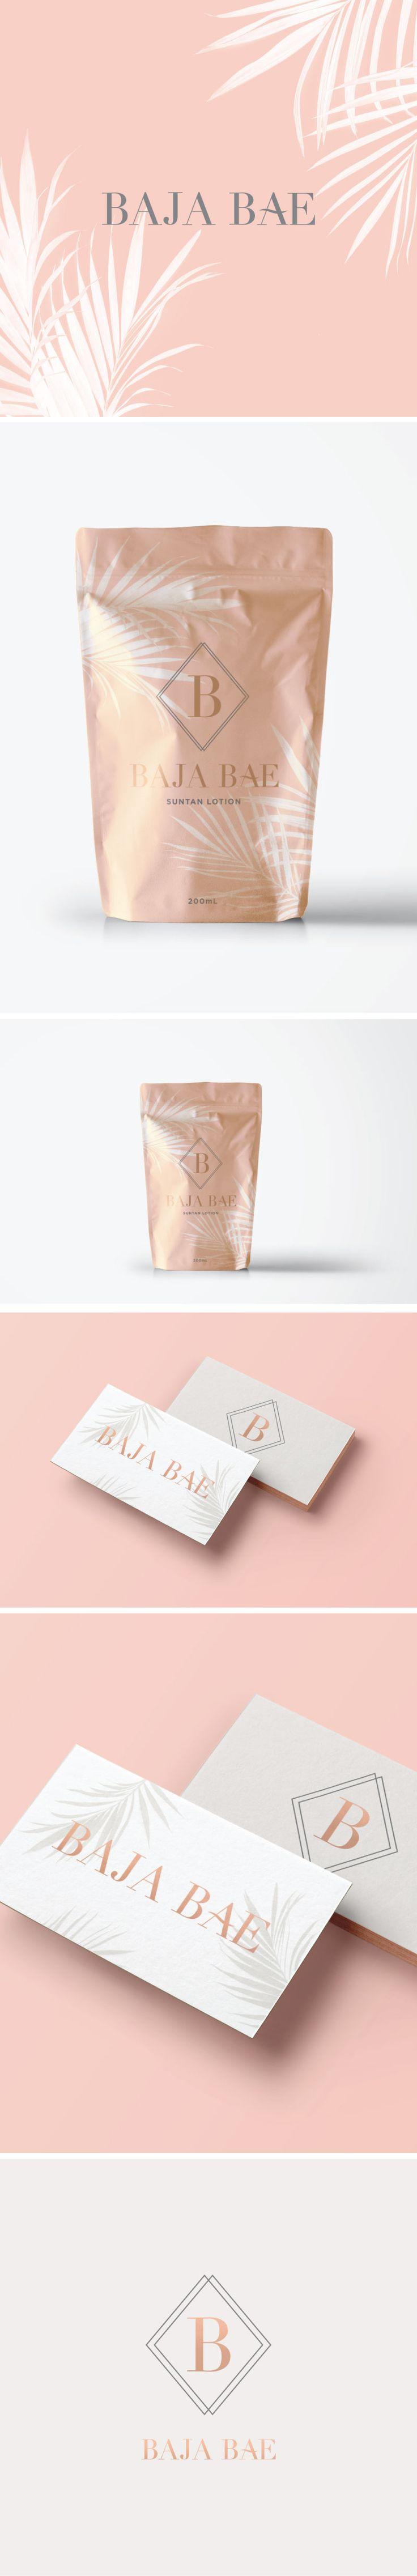 packaging design, logo design, branding, logo, copper foil, business cards, business card design, design, blush logo, palm leaves, palms, beach logo